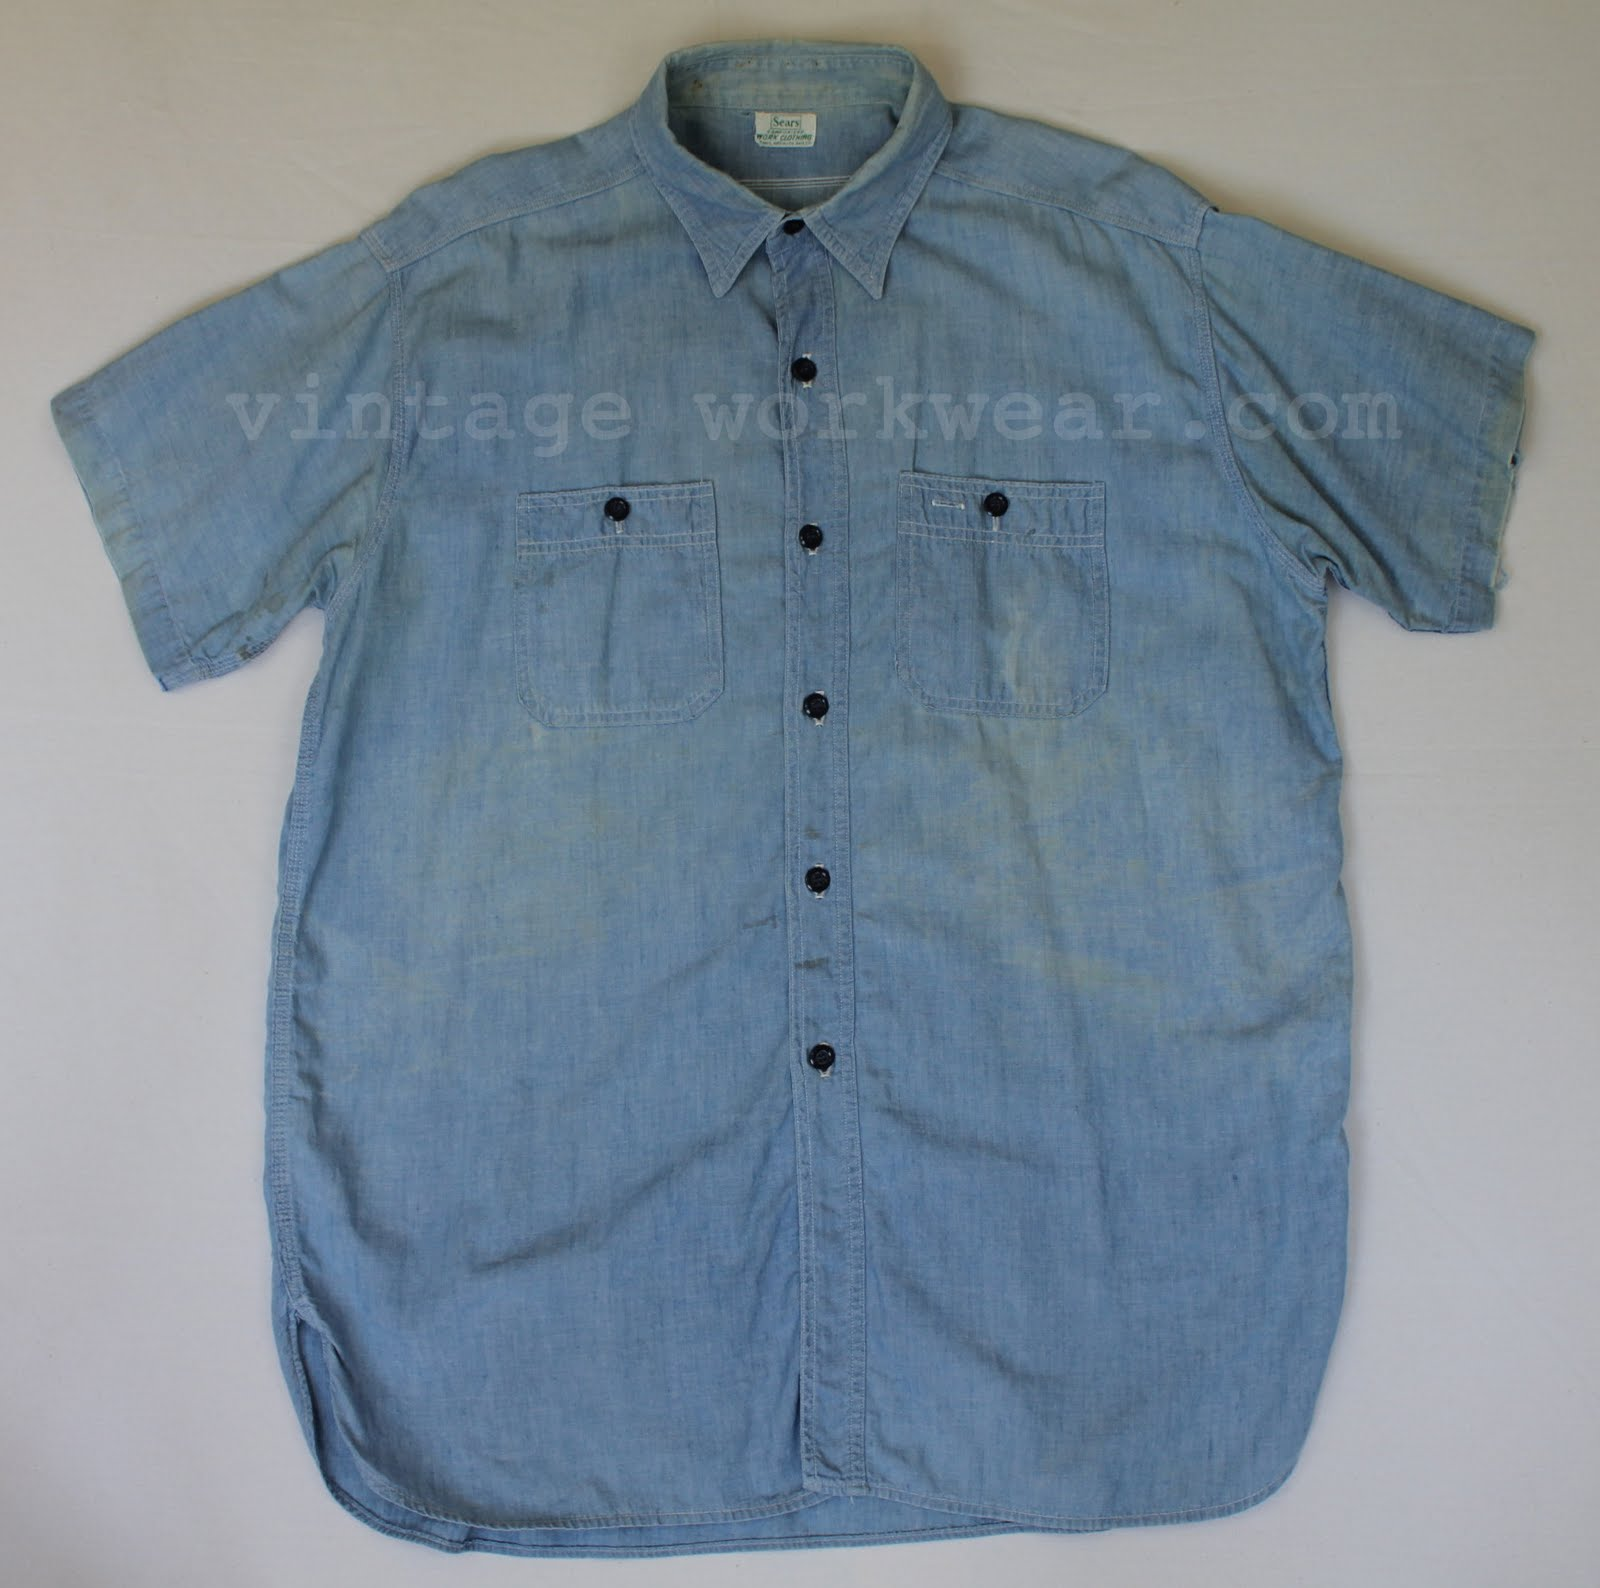 dac33b2b0a 1950 s era Sears WORK CLOTHING Hercules style sanforized s s chambray work  shirt